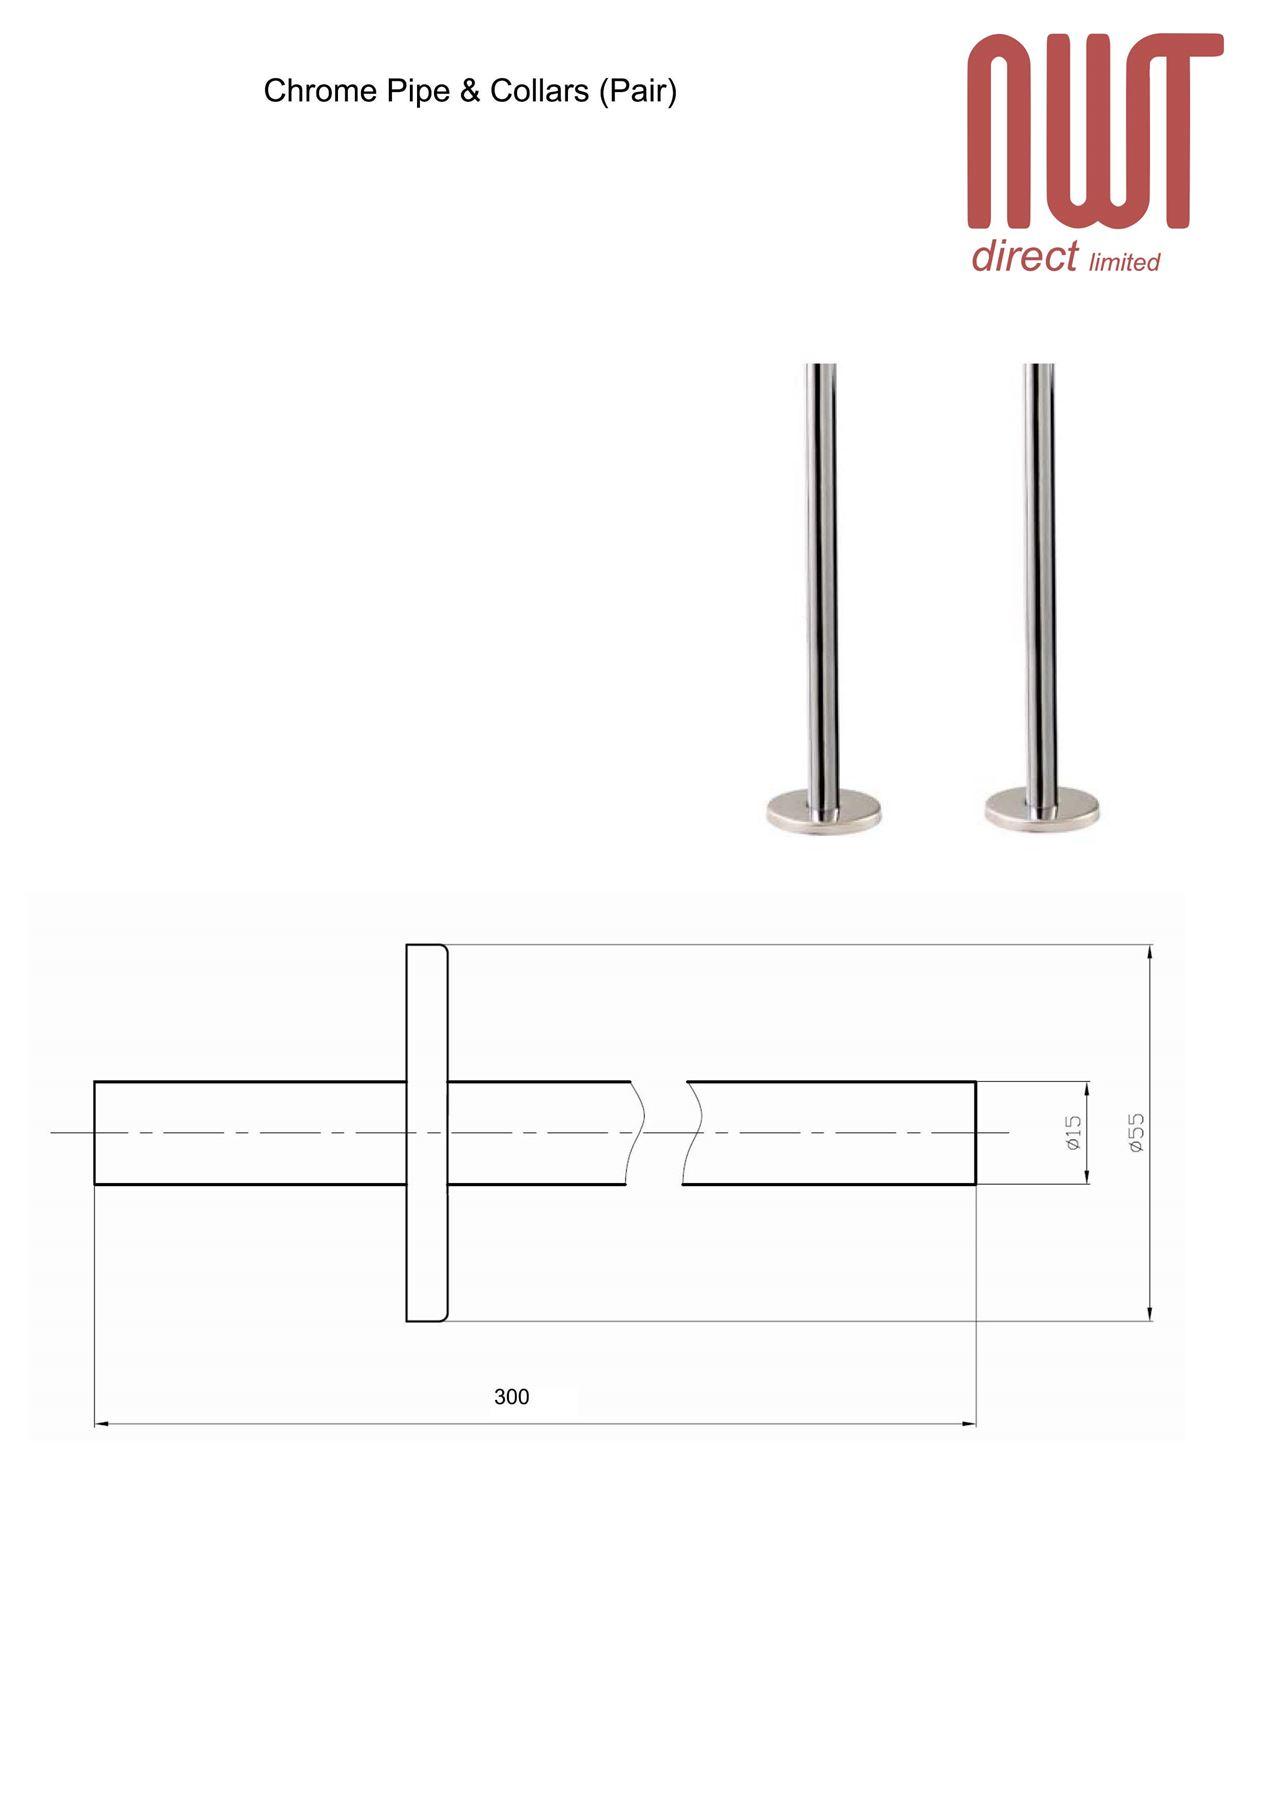 Chrome Pipe Amp Collars Pair For Radiators Towel Rails Valves Accessories